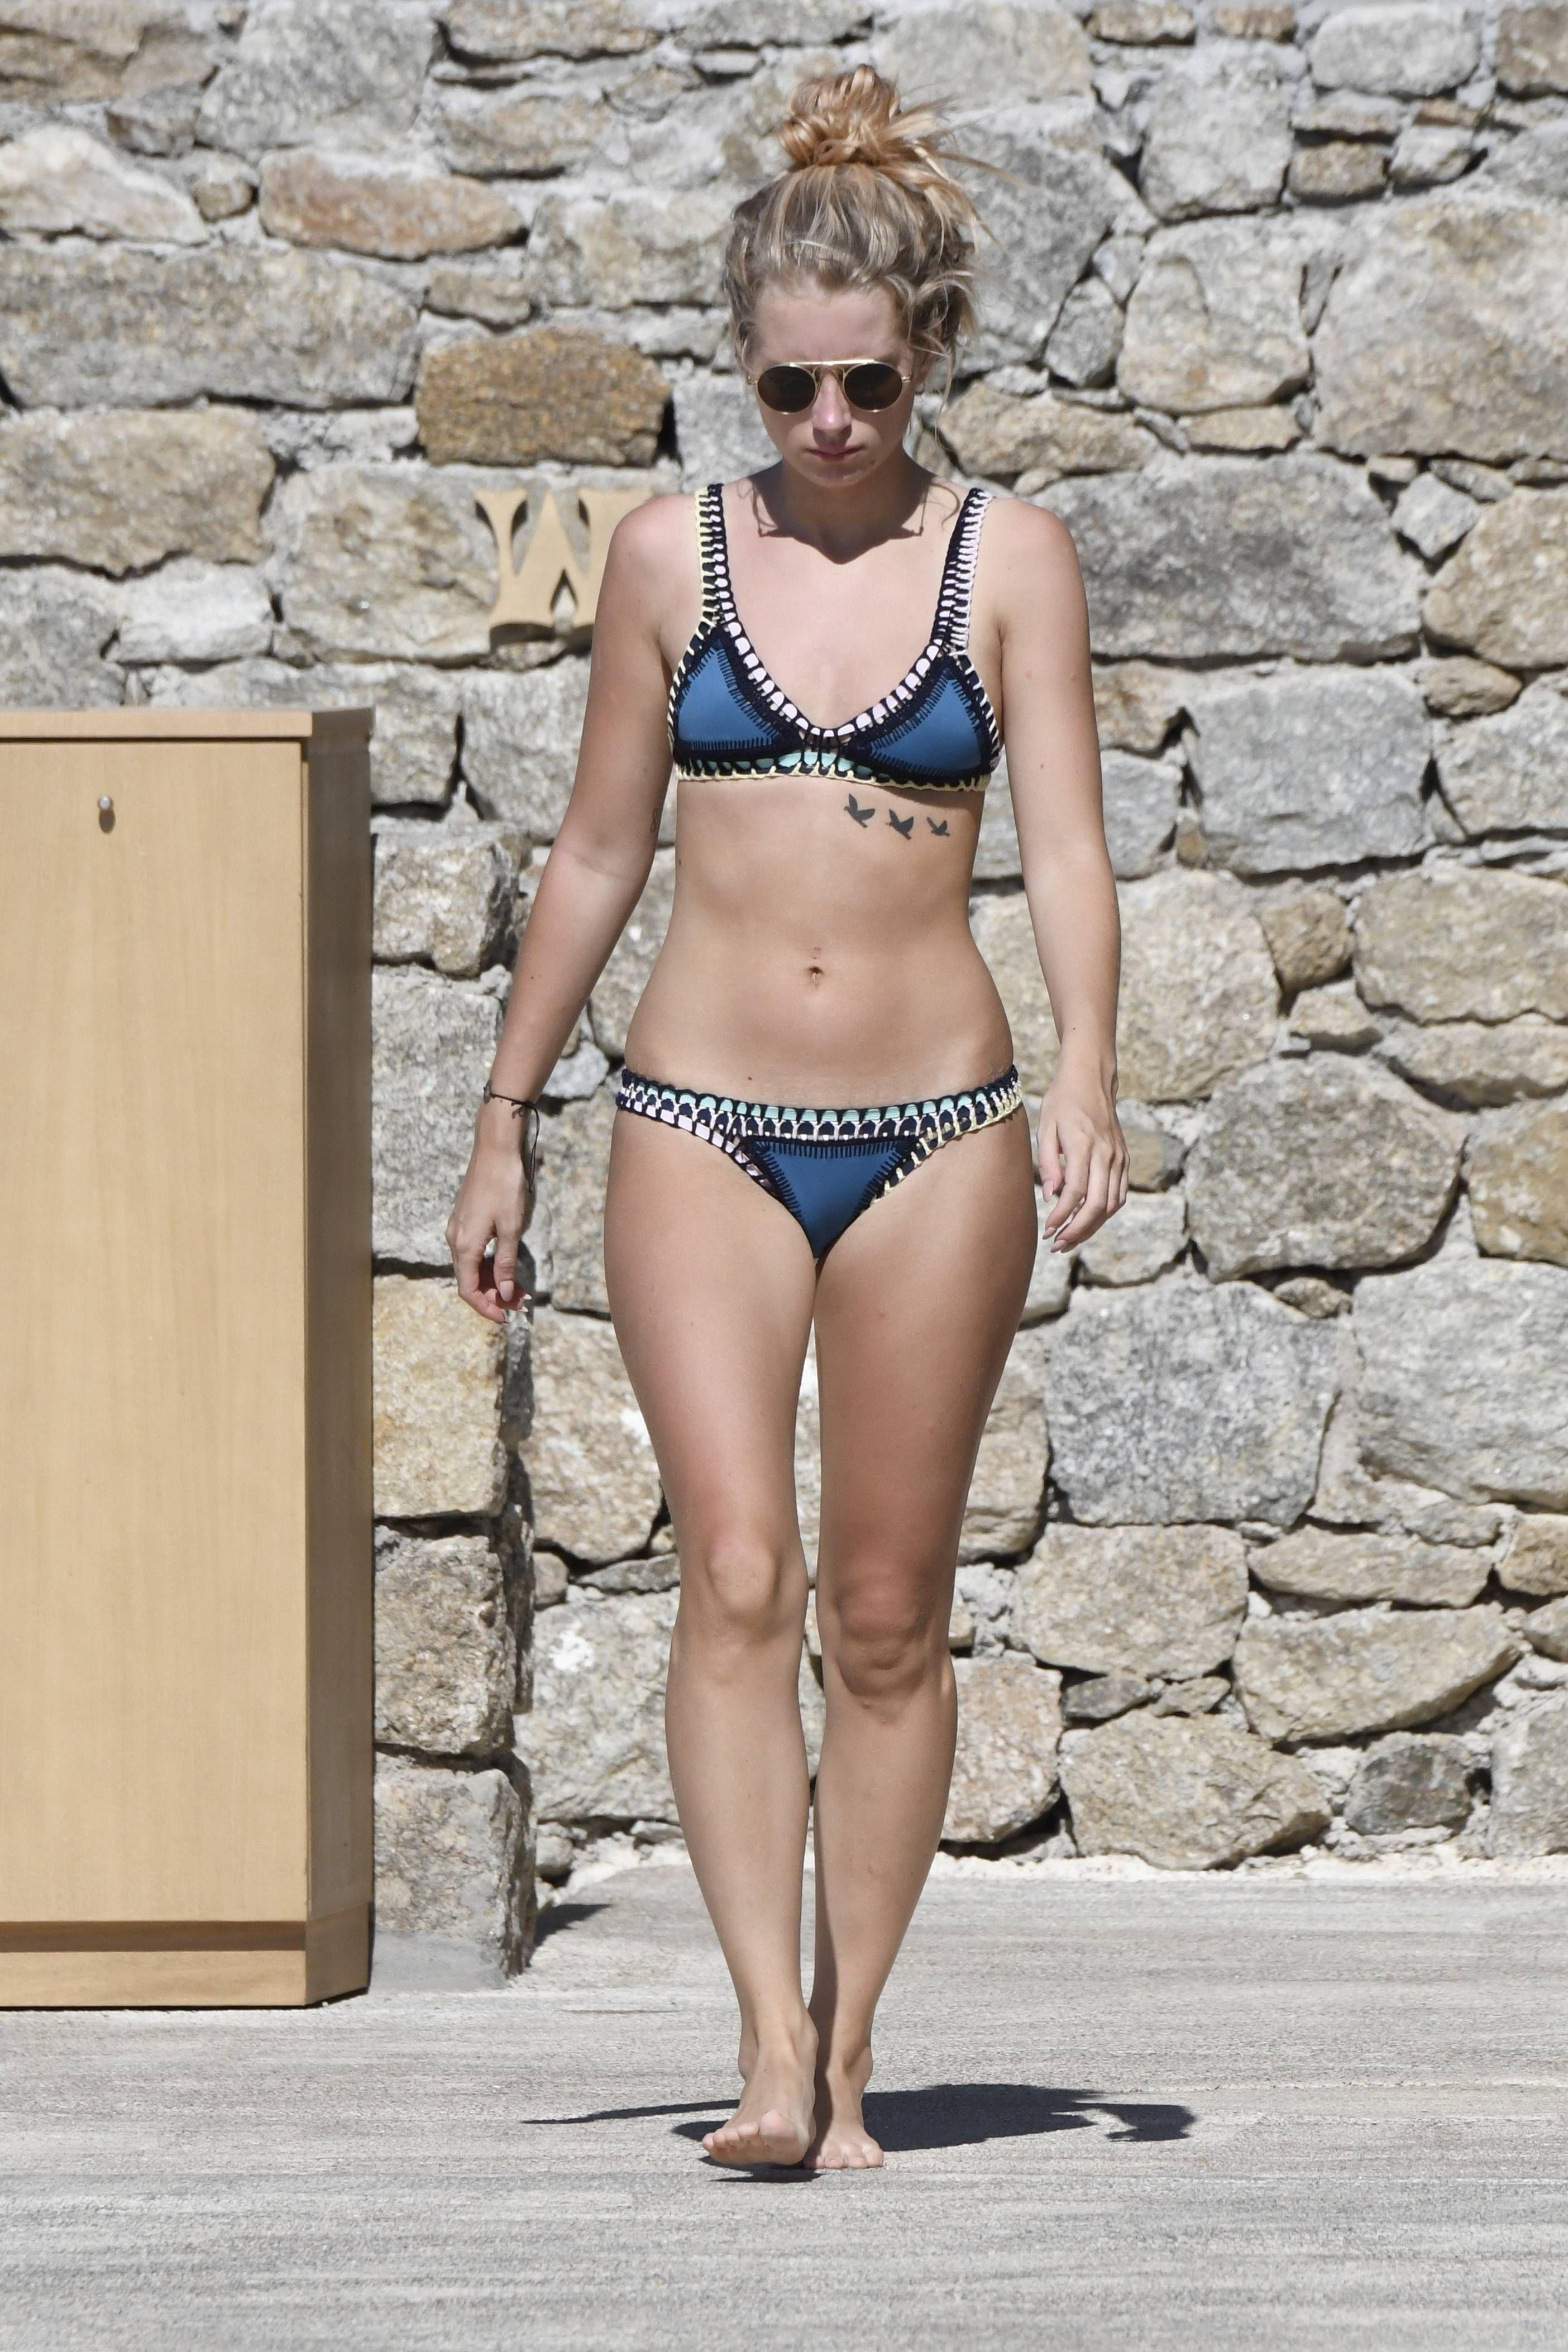 Lottie Moss Bikini photo 12